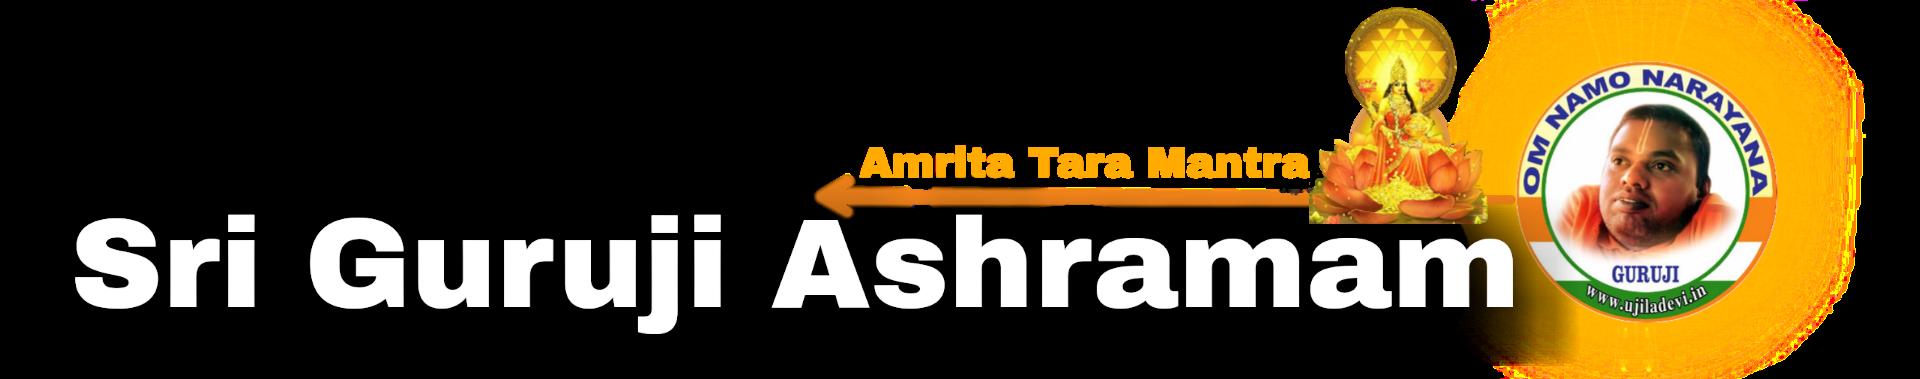 Amrita Tara Mantra  ☀️  Sri Guruji Ashramam